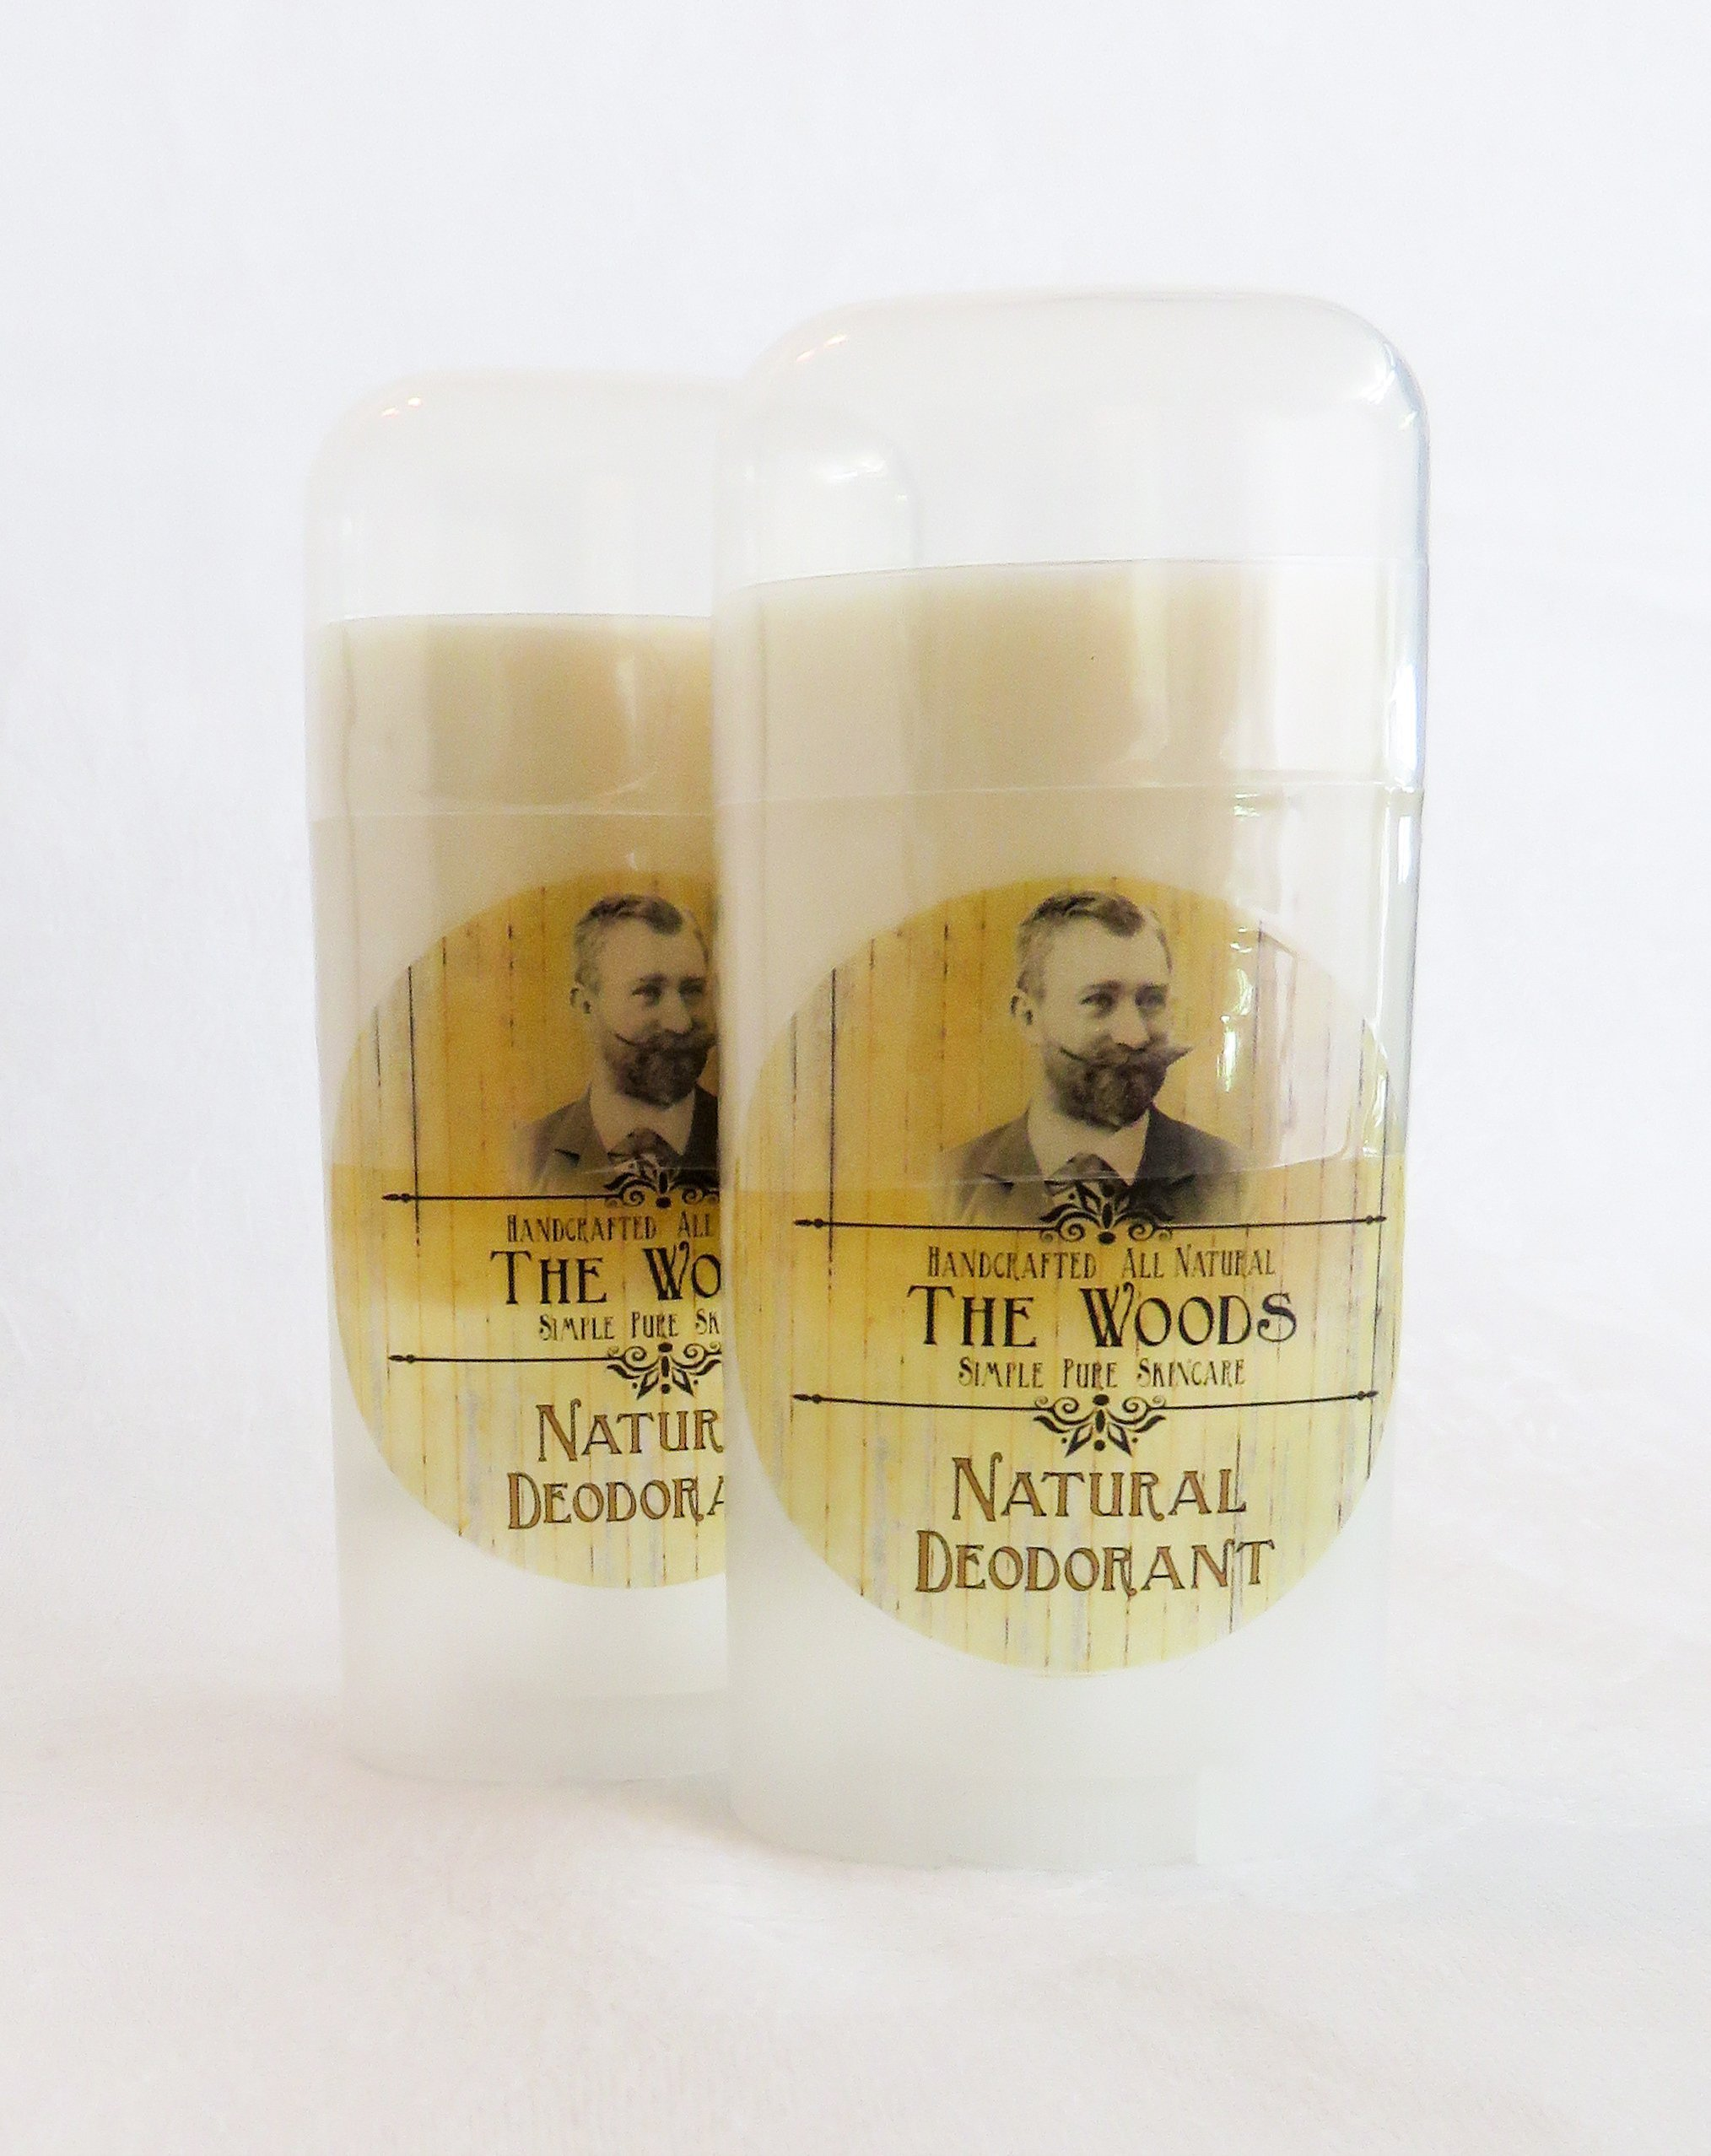 The Woods Sandalwood Natural Deodorant by Summer's Skin